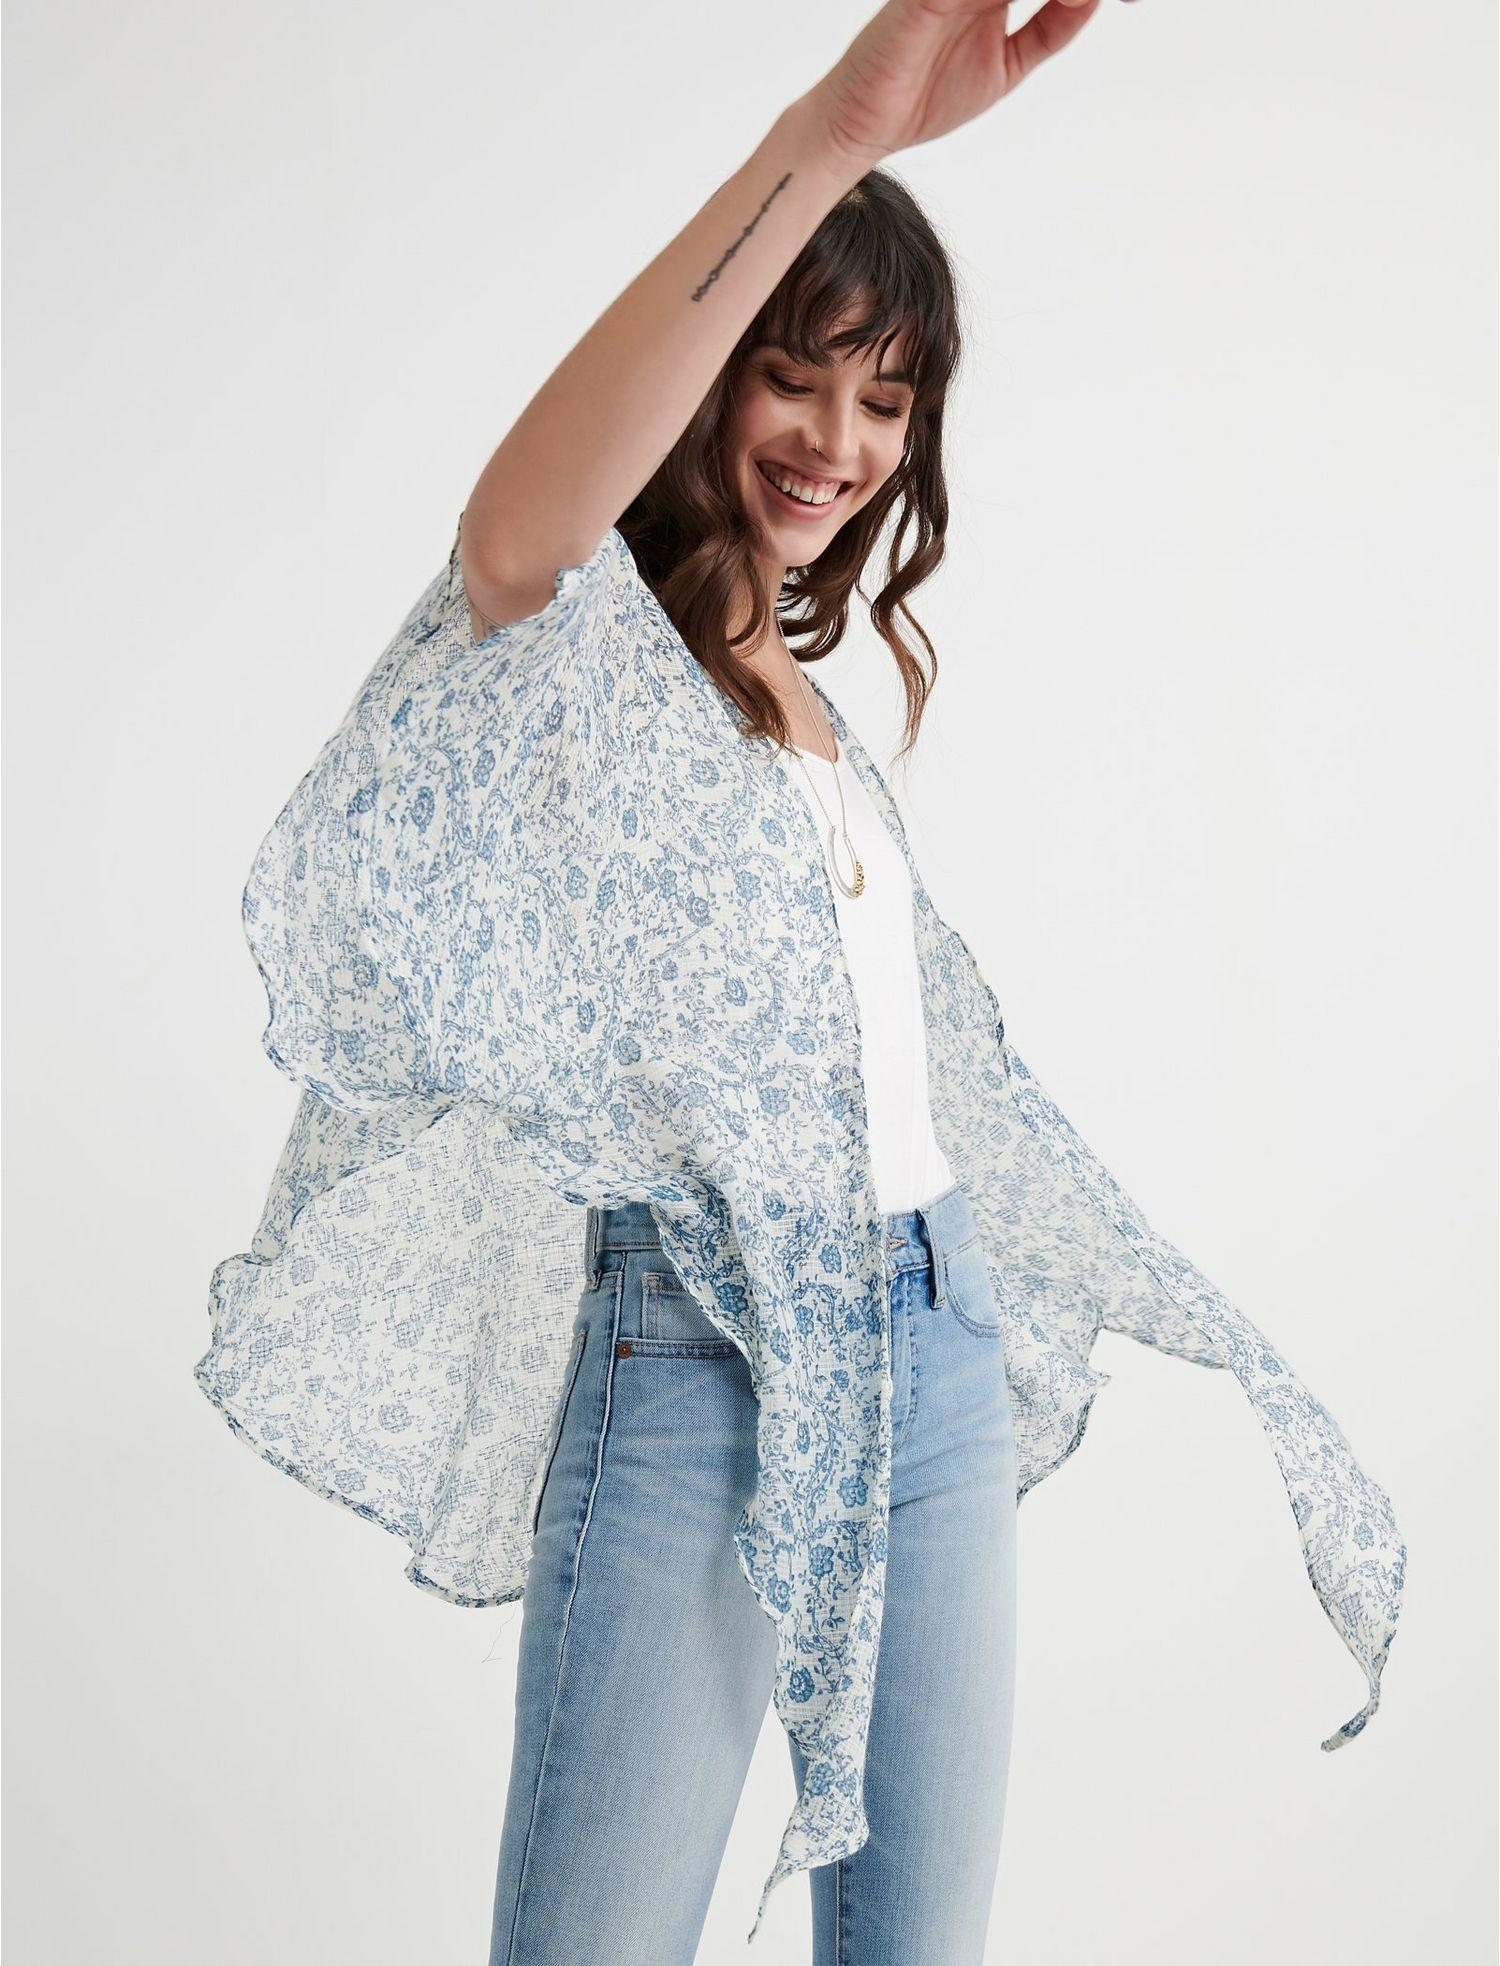 fed5e60dd8abcf Lyst - Lucky Brand Floral Printed Tie Kimono